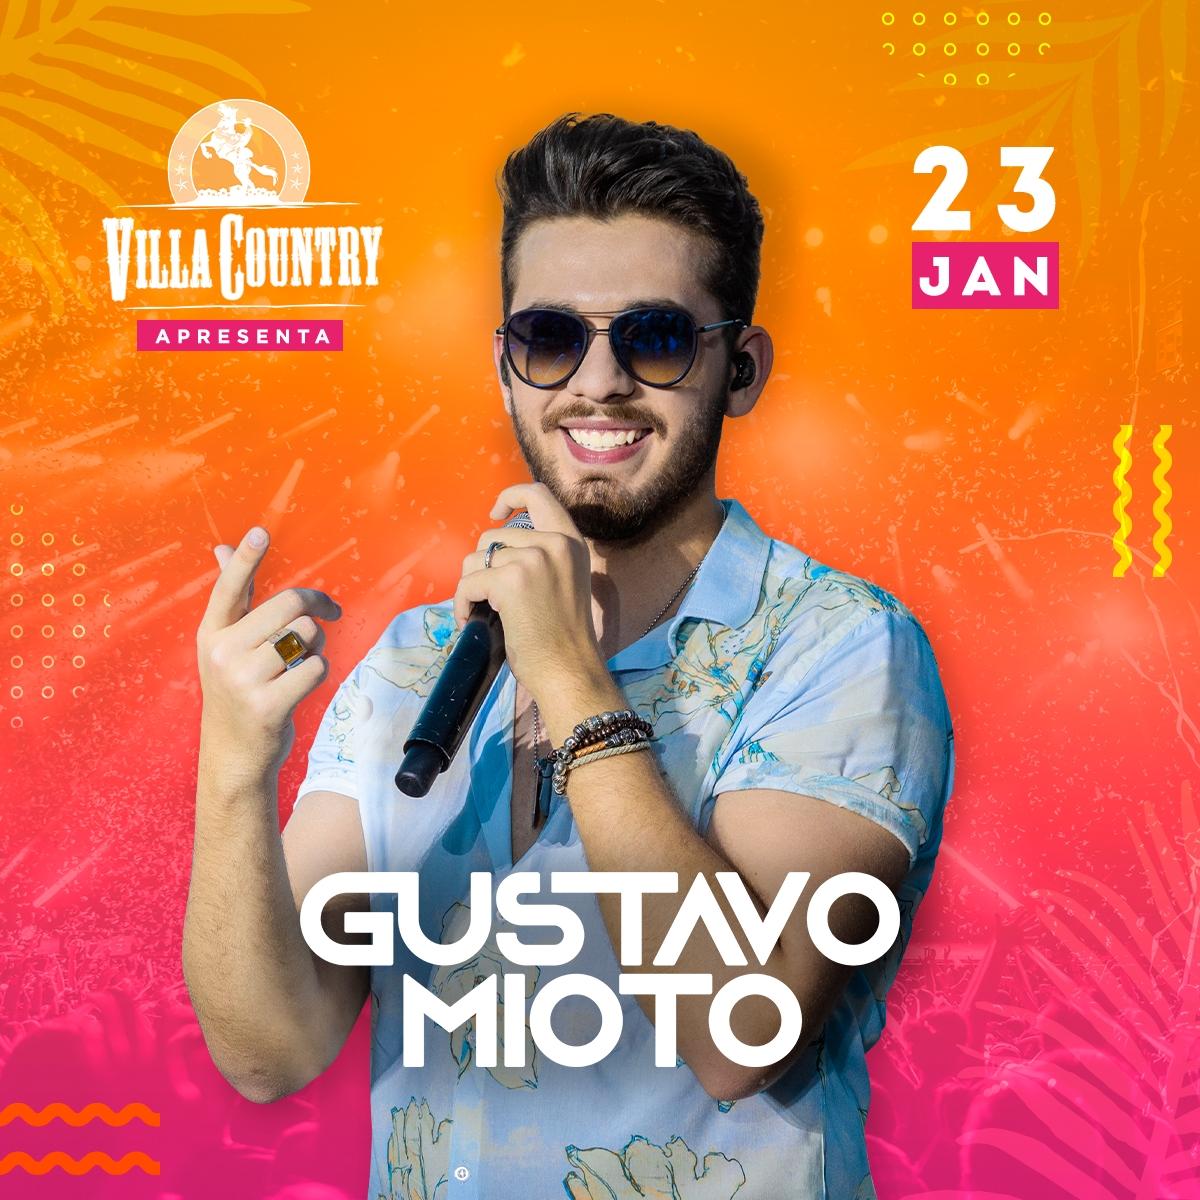 Gustavo Mioto com novo show no Villa Country 41